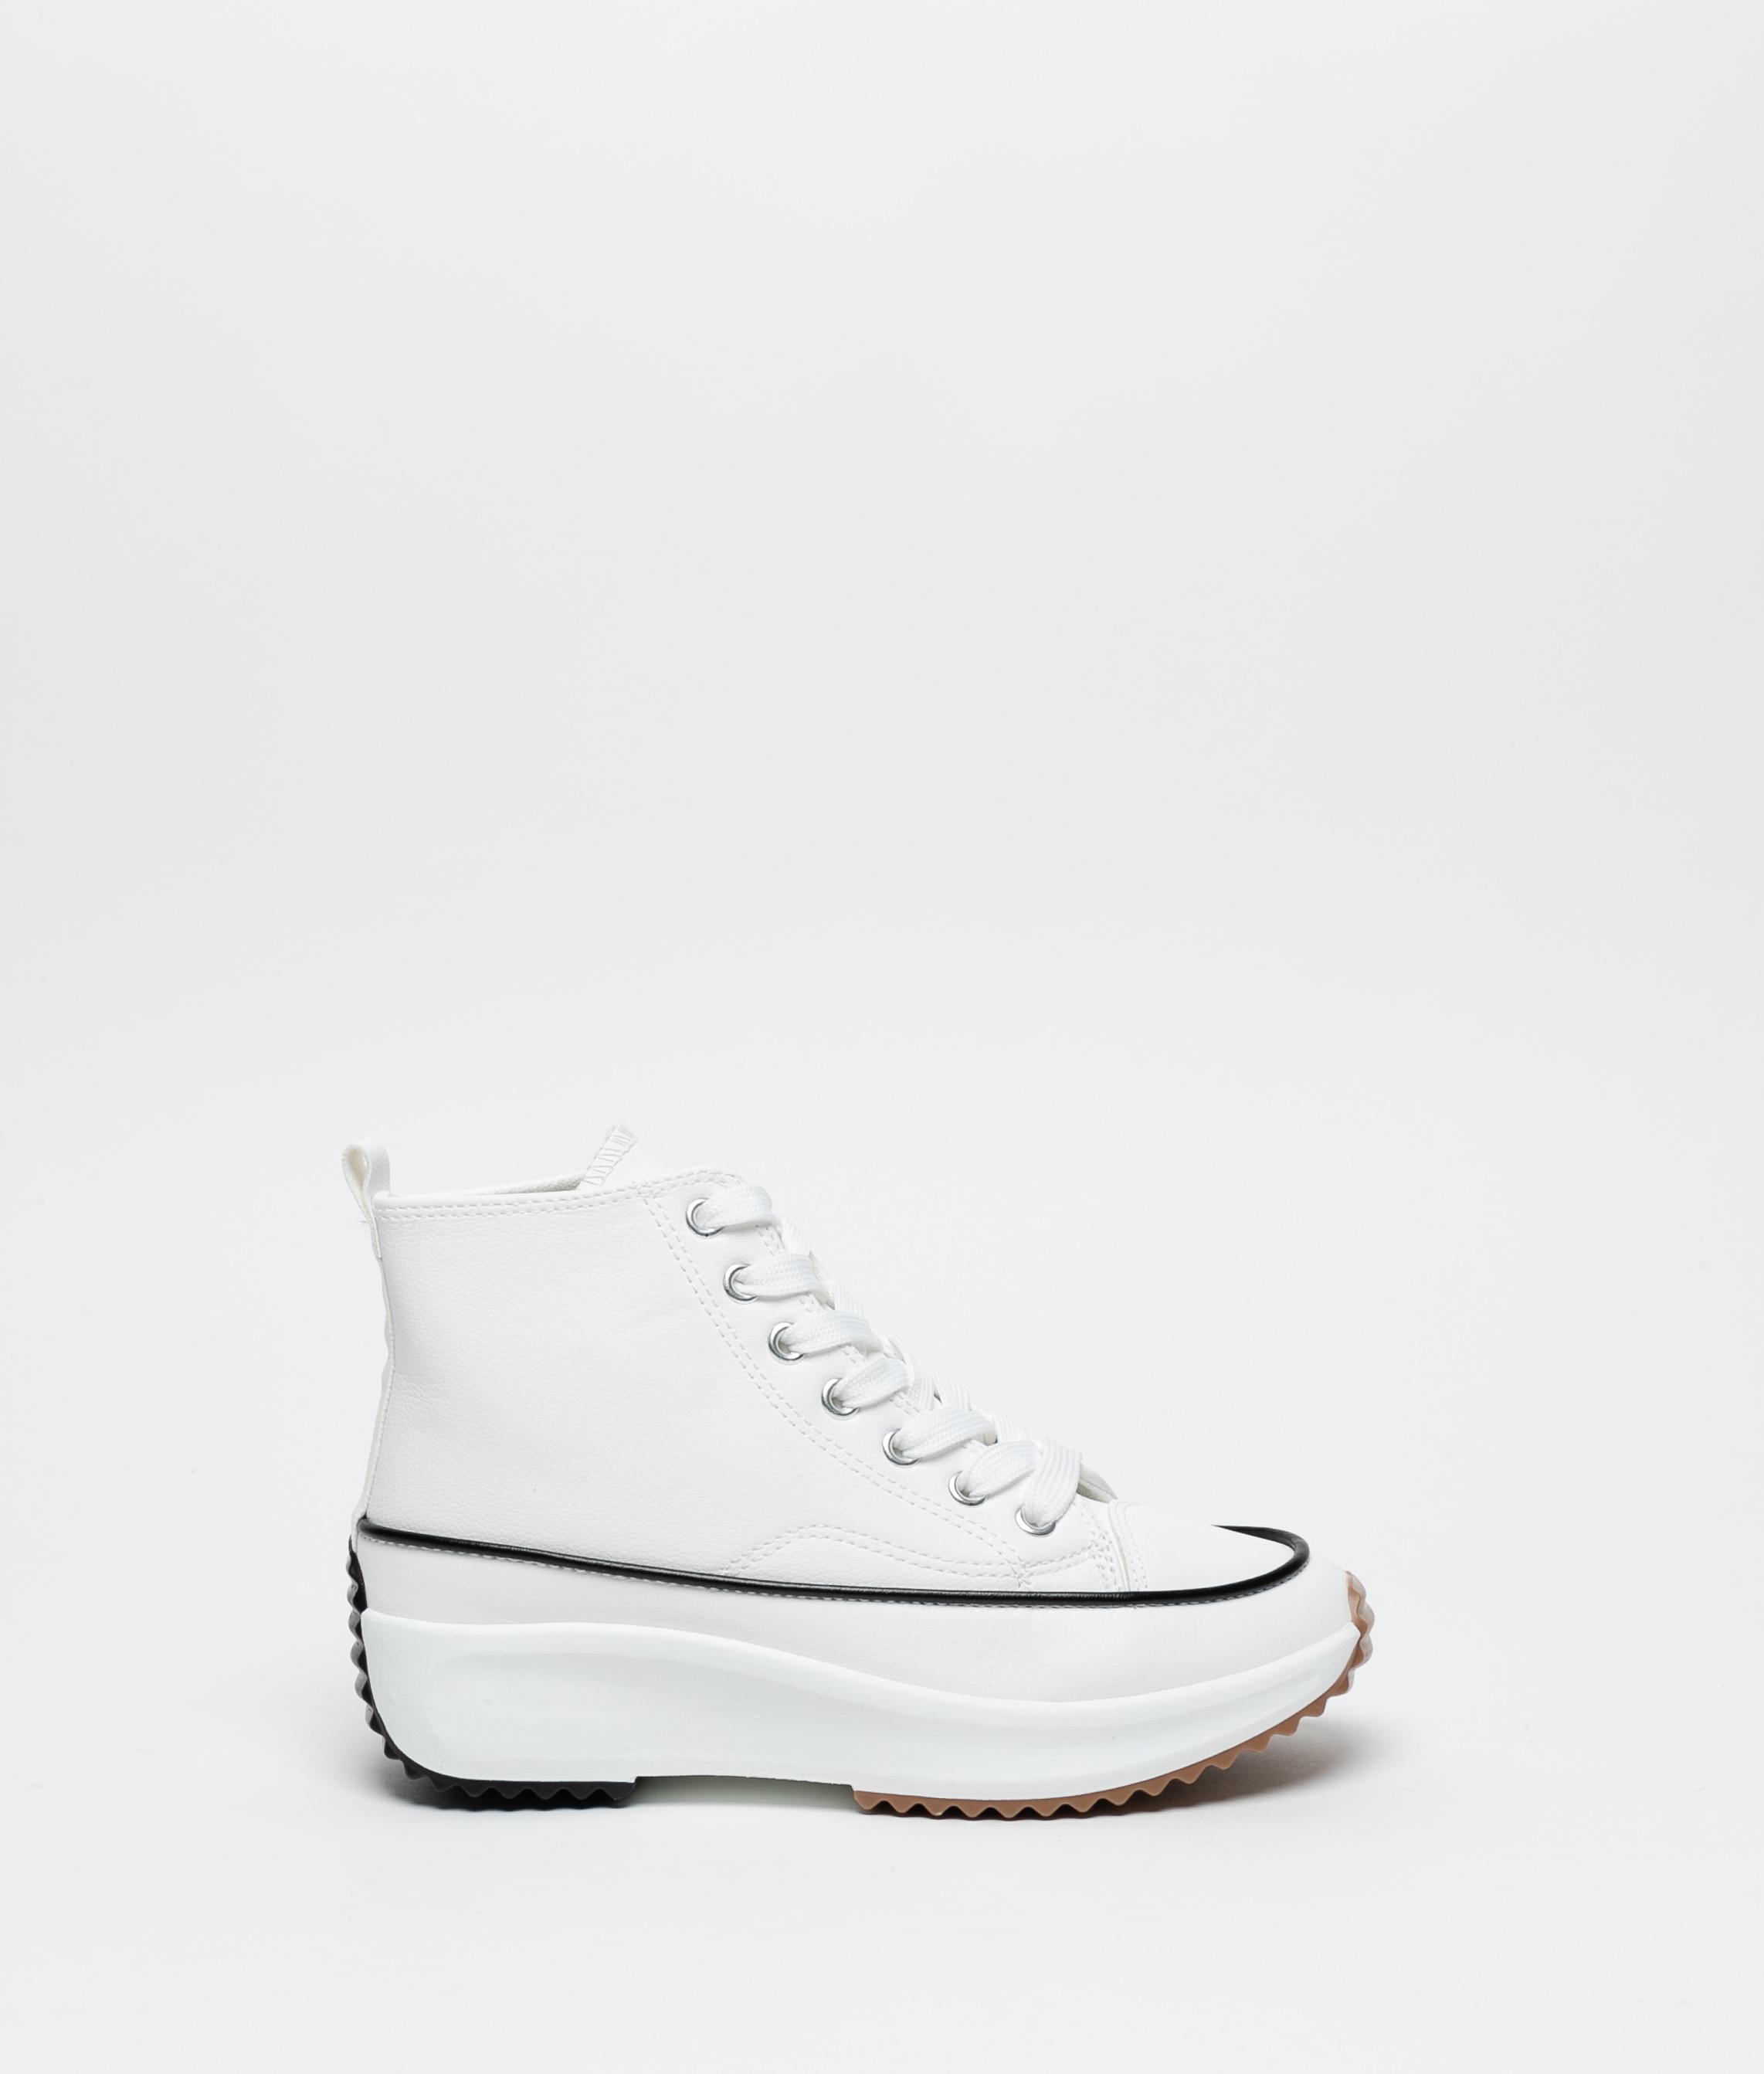 Sneakers Rimbal - White